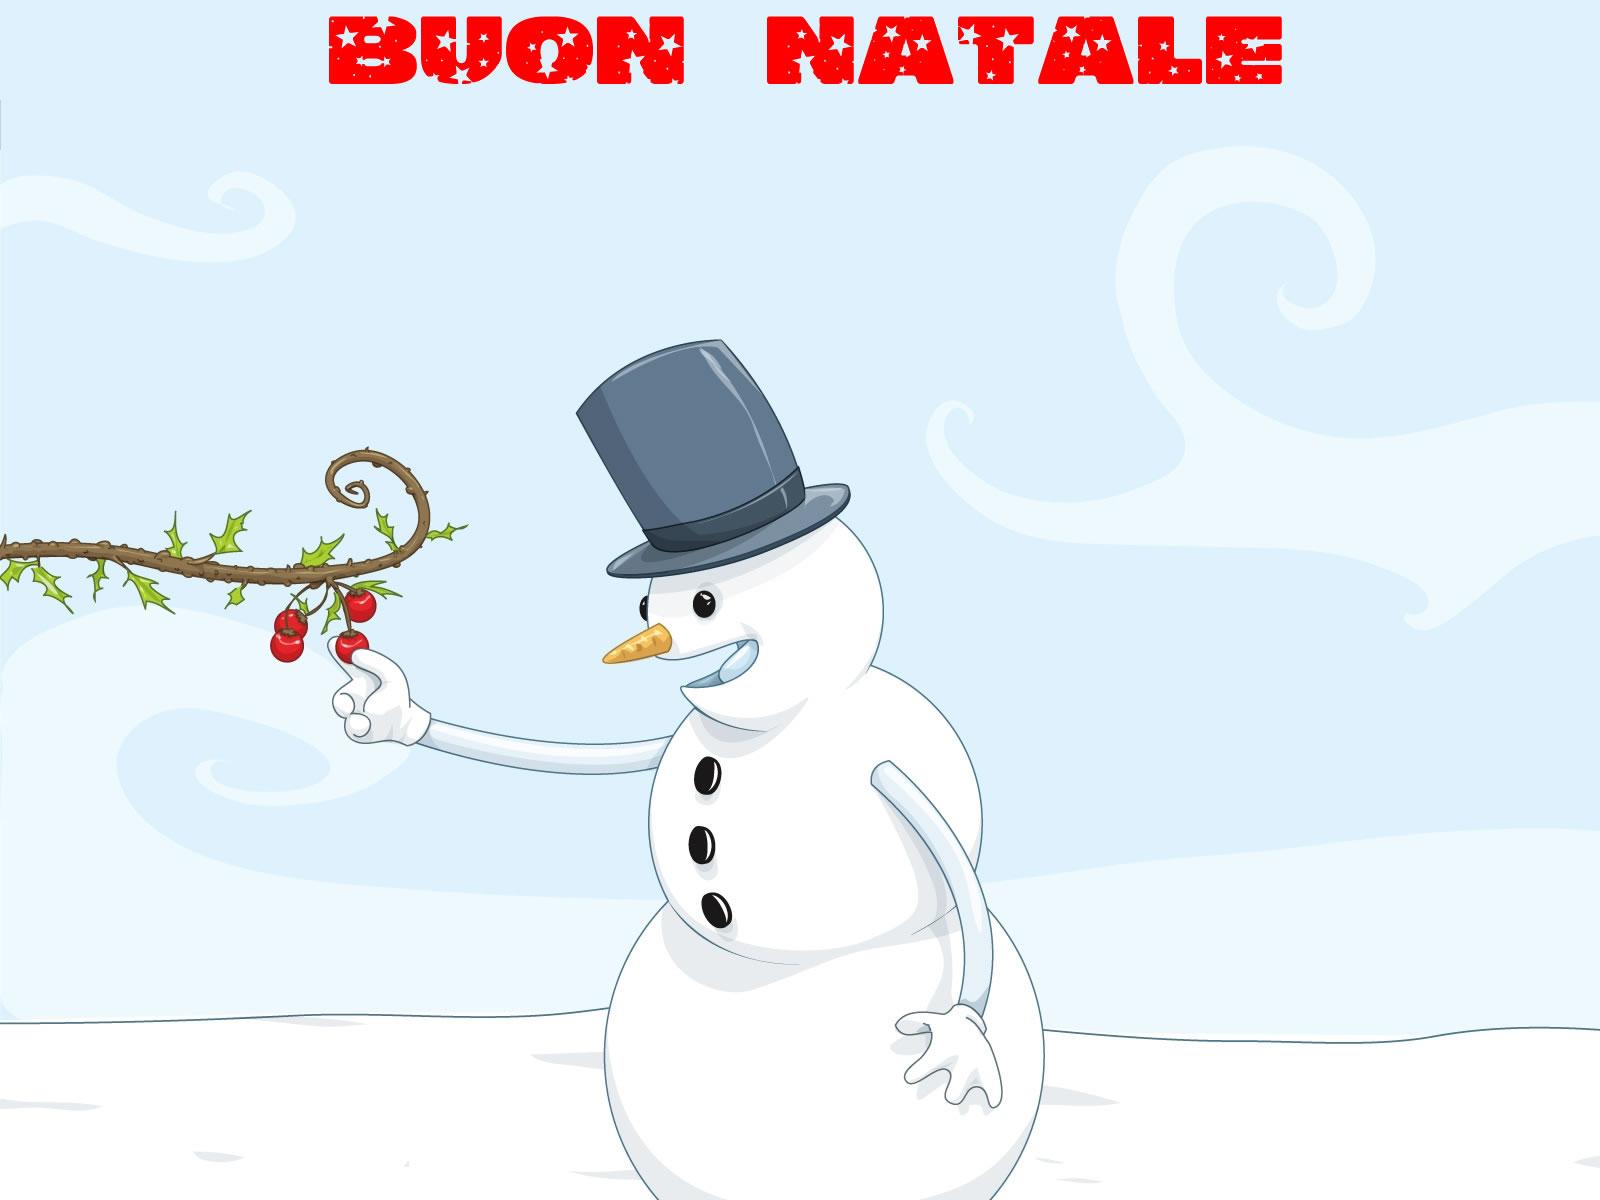 Sfondi Natale - Sfondo Natale pupazzo di neve